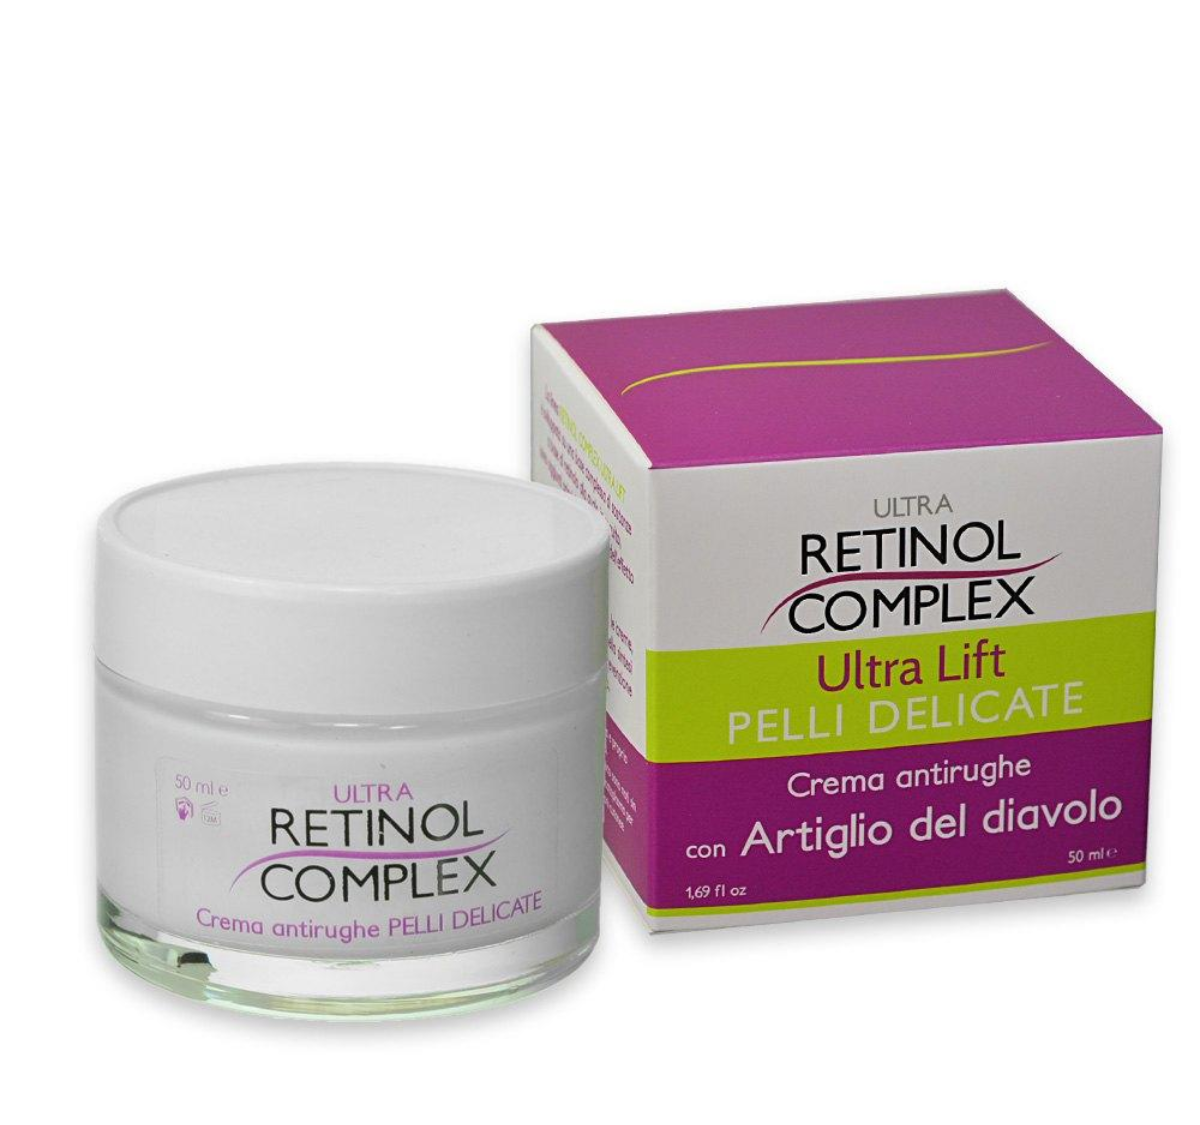 Crema Antirughe Pelli Delicate Retinol Complex